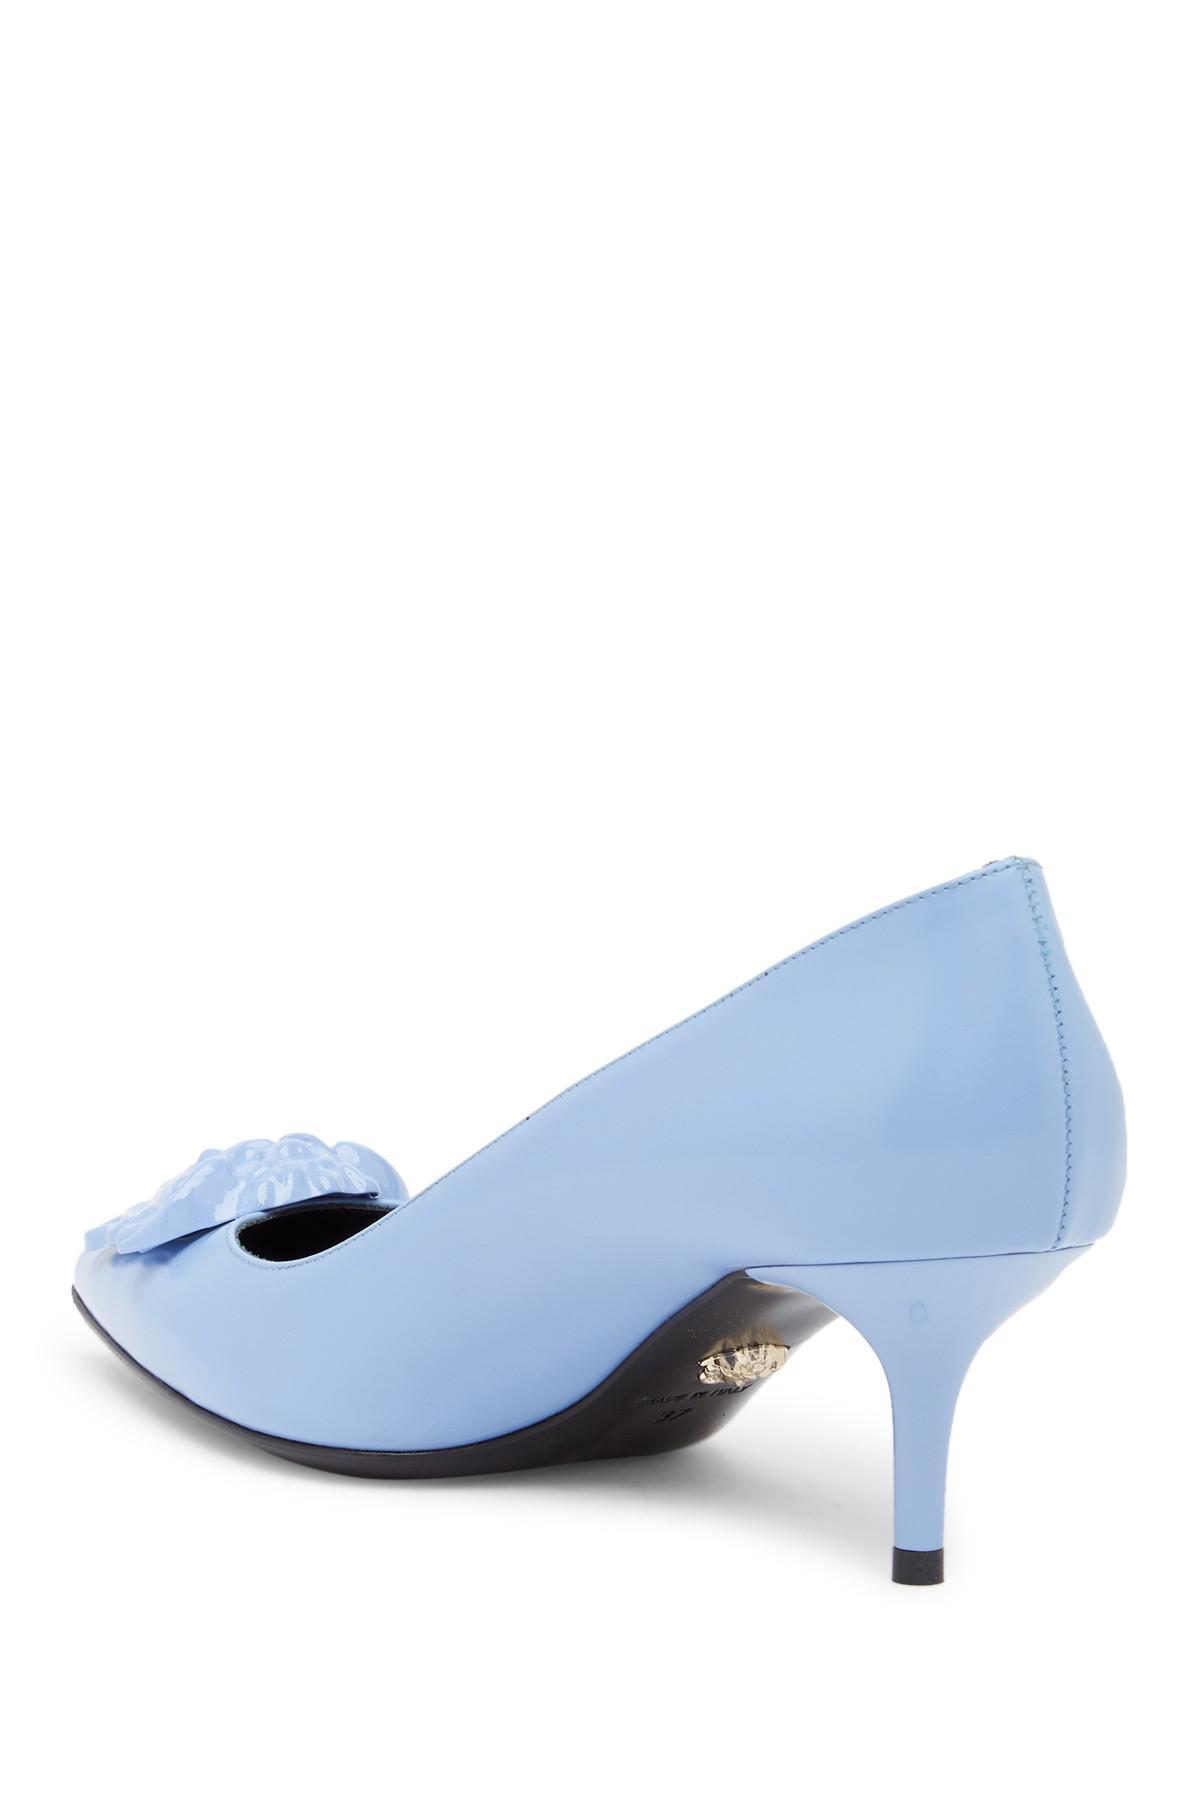 Versace Medusa Kitten Heel in Blue - Lyst